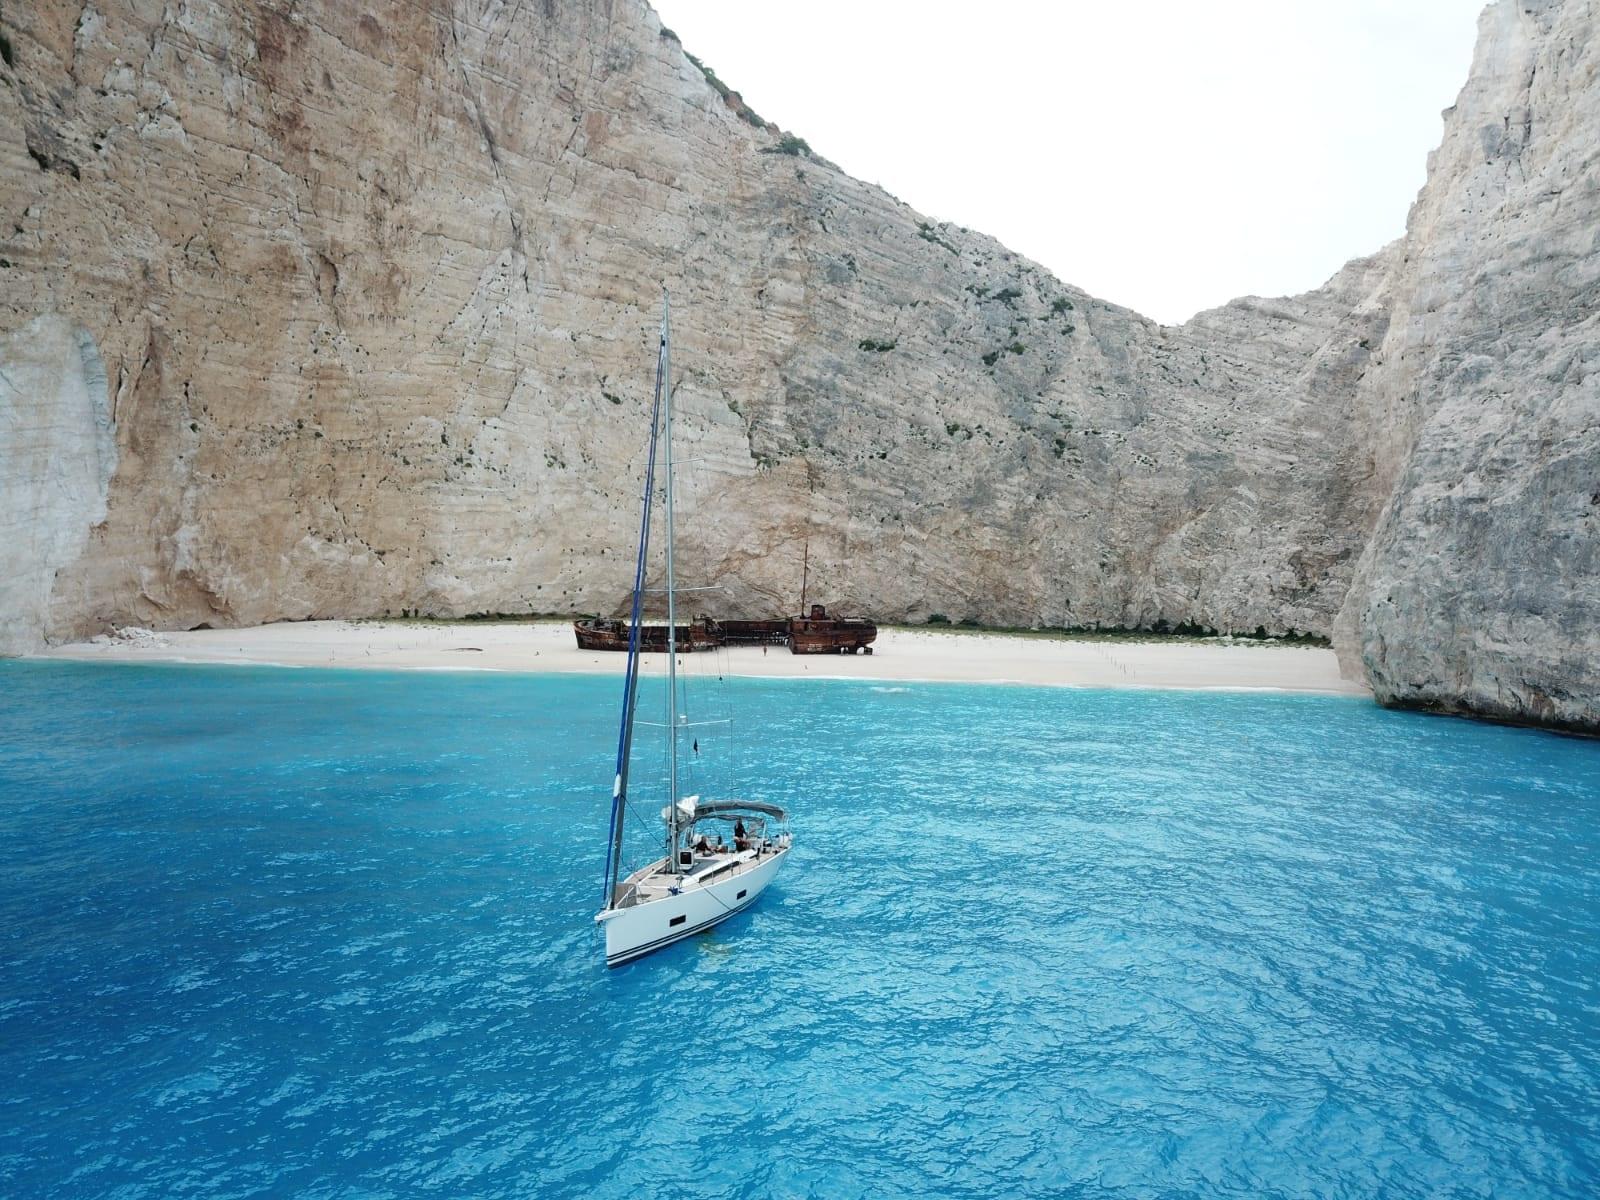 Solaris47 Fastsailing Charter Ionian Sea Greece